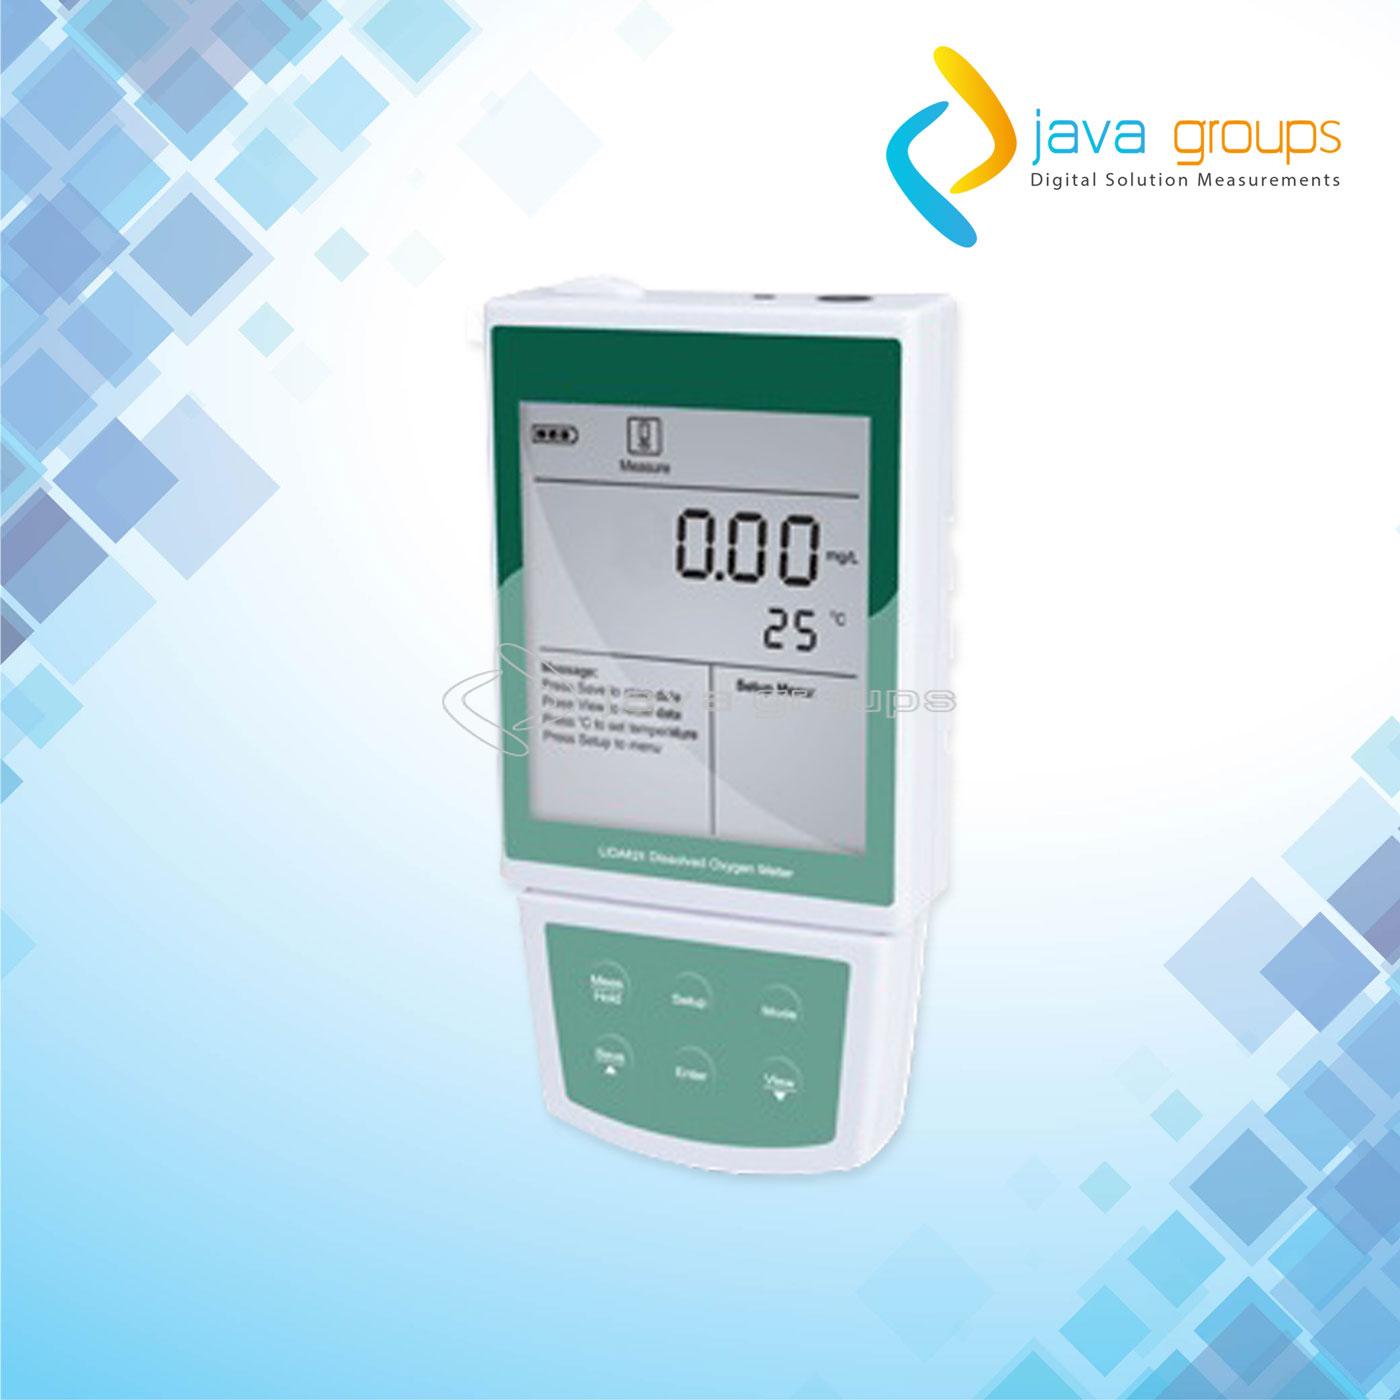 Alat Pengukur Digital Oksigen Terlarut Portabel DO-821